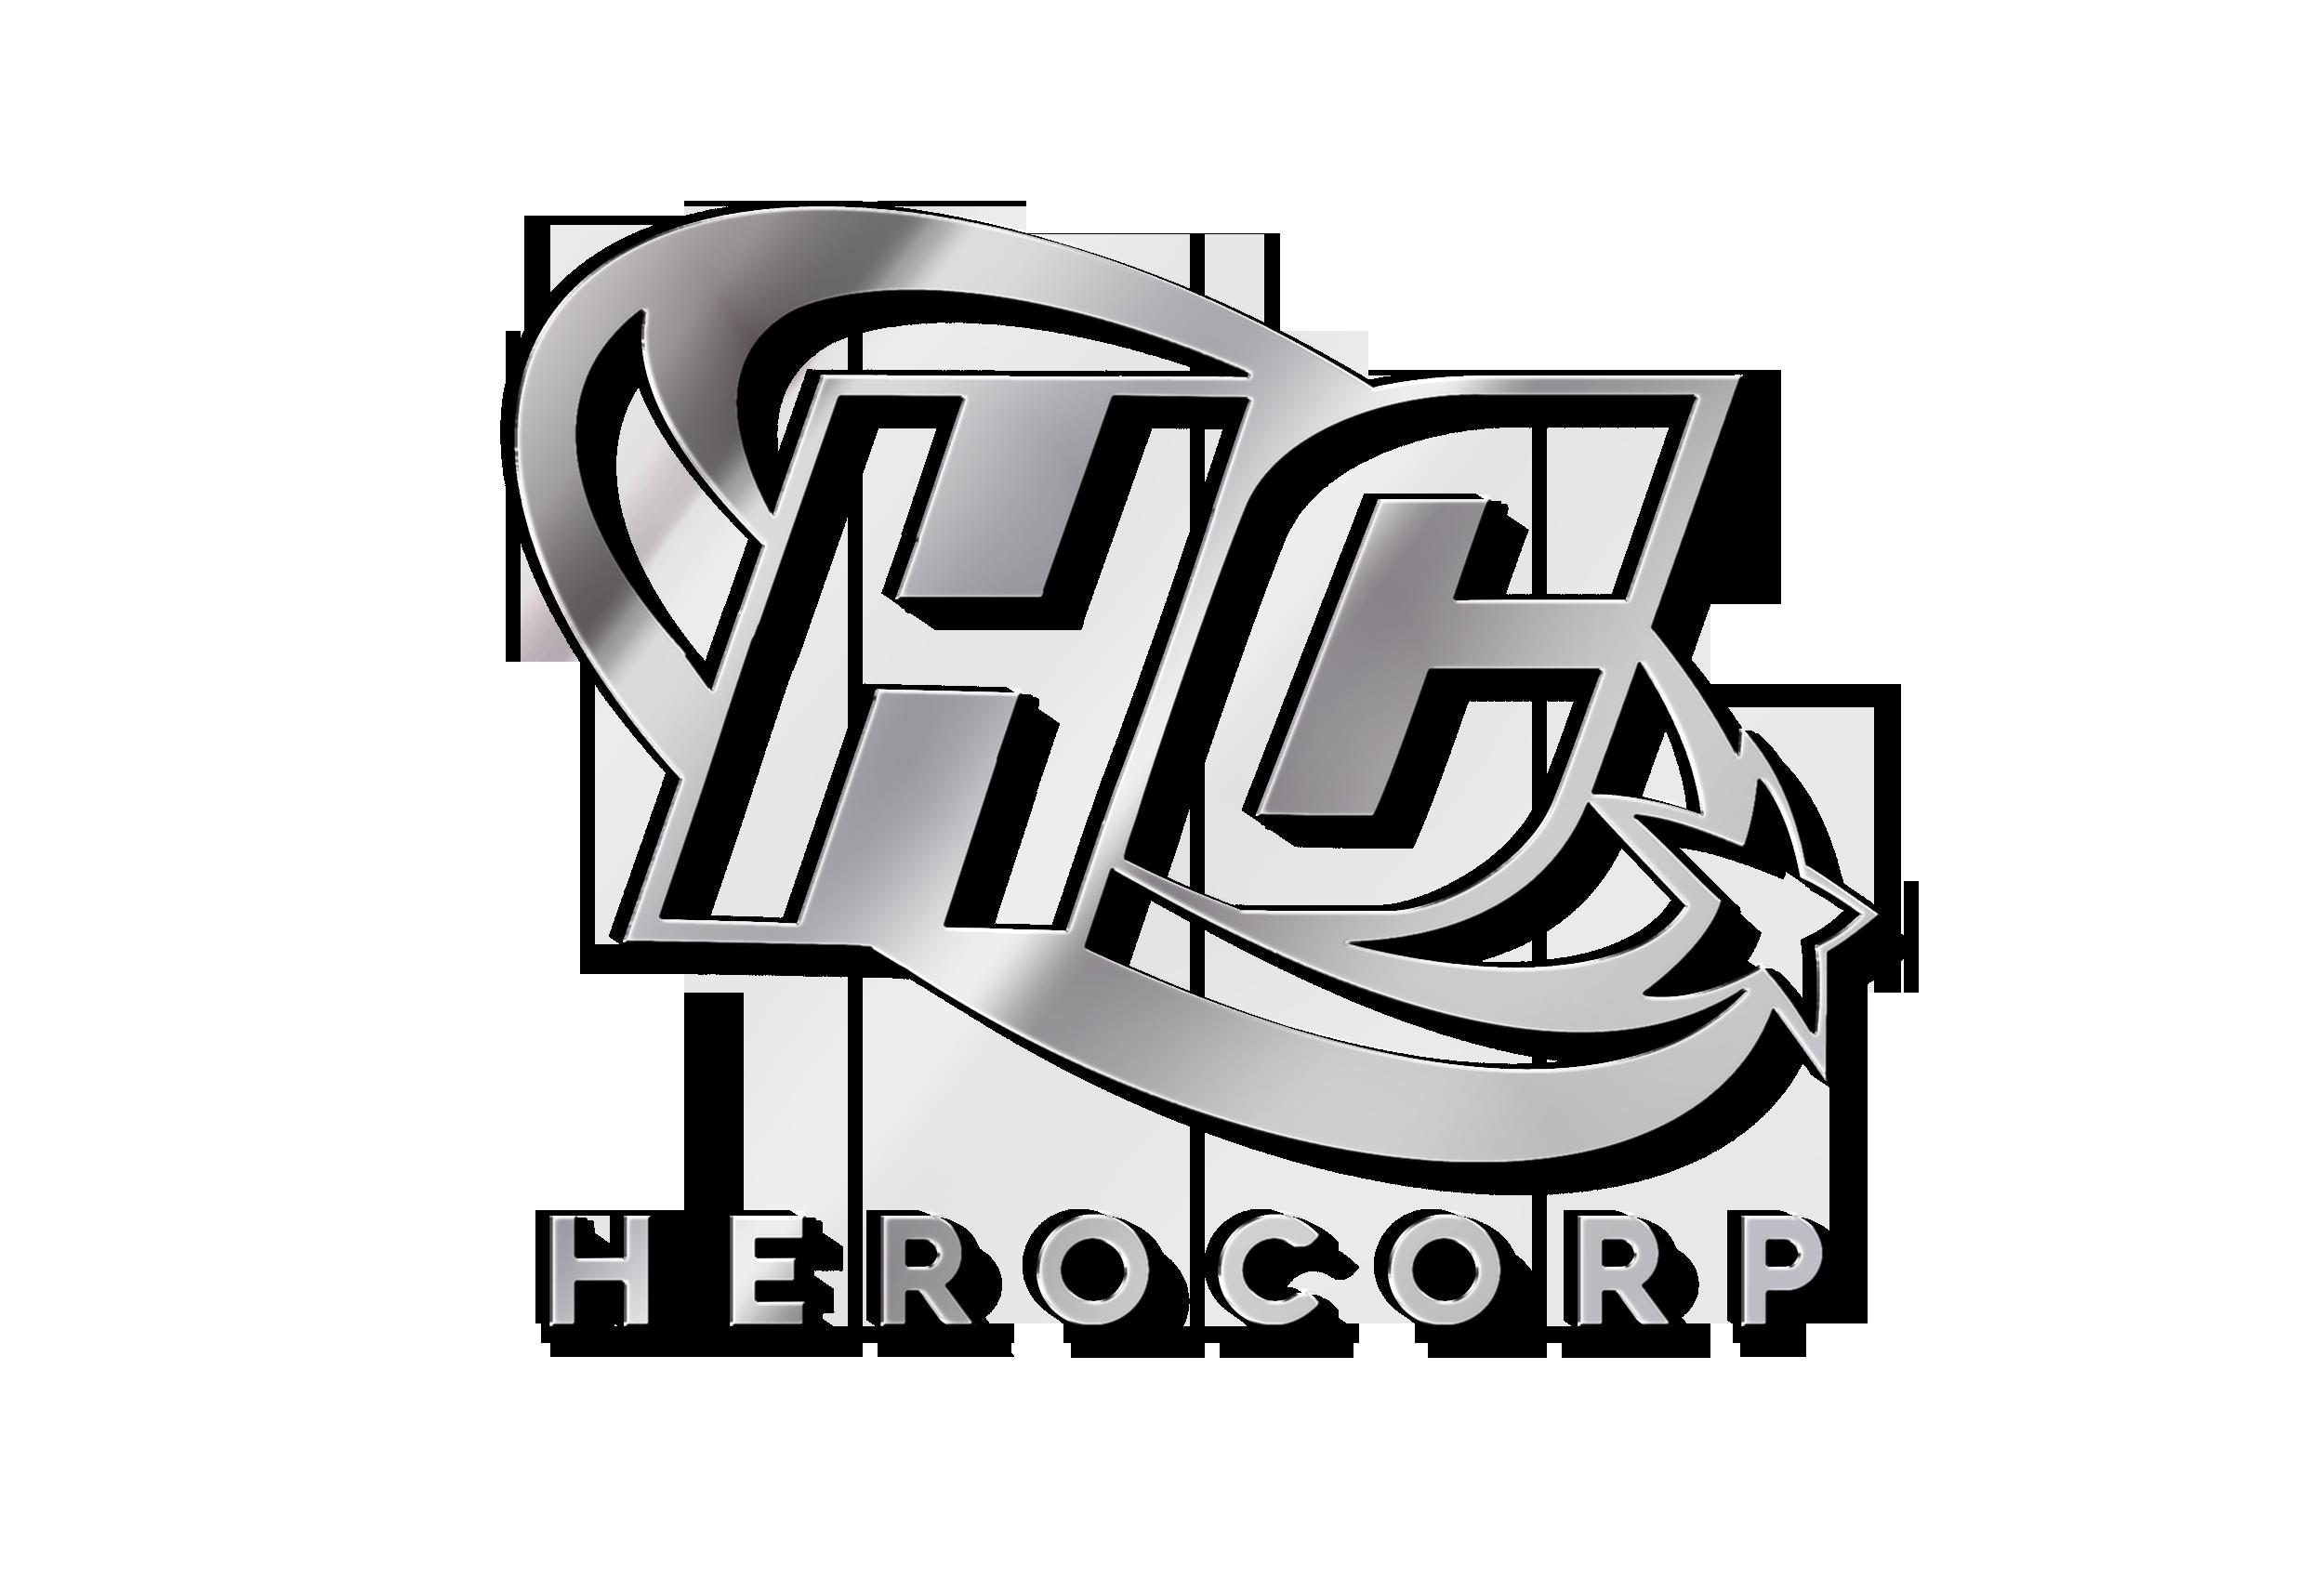 HeroCorp